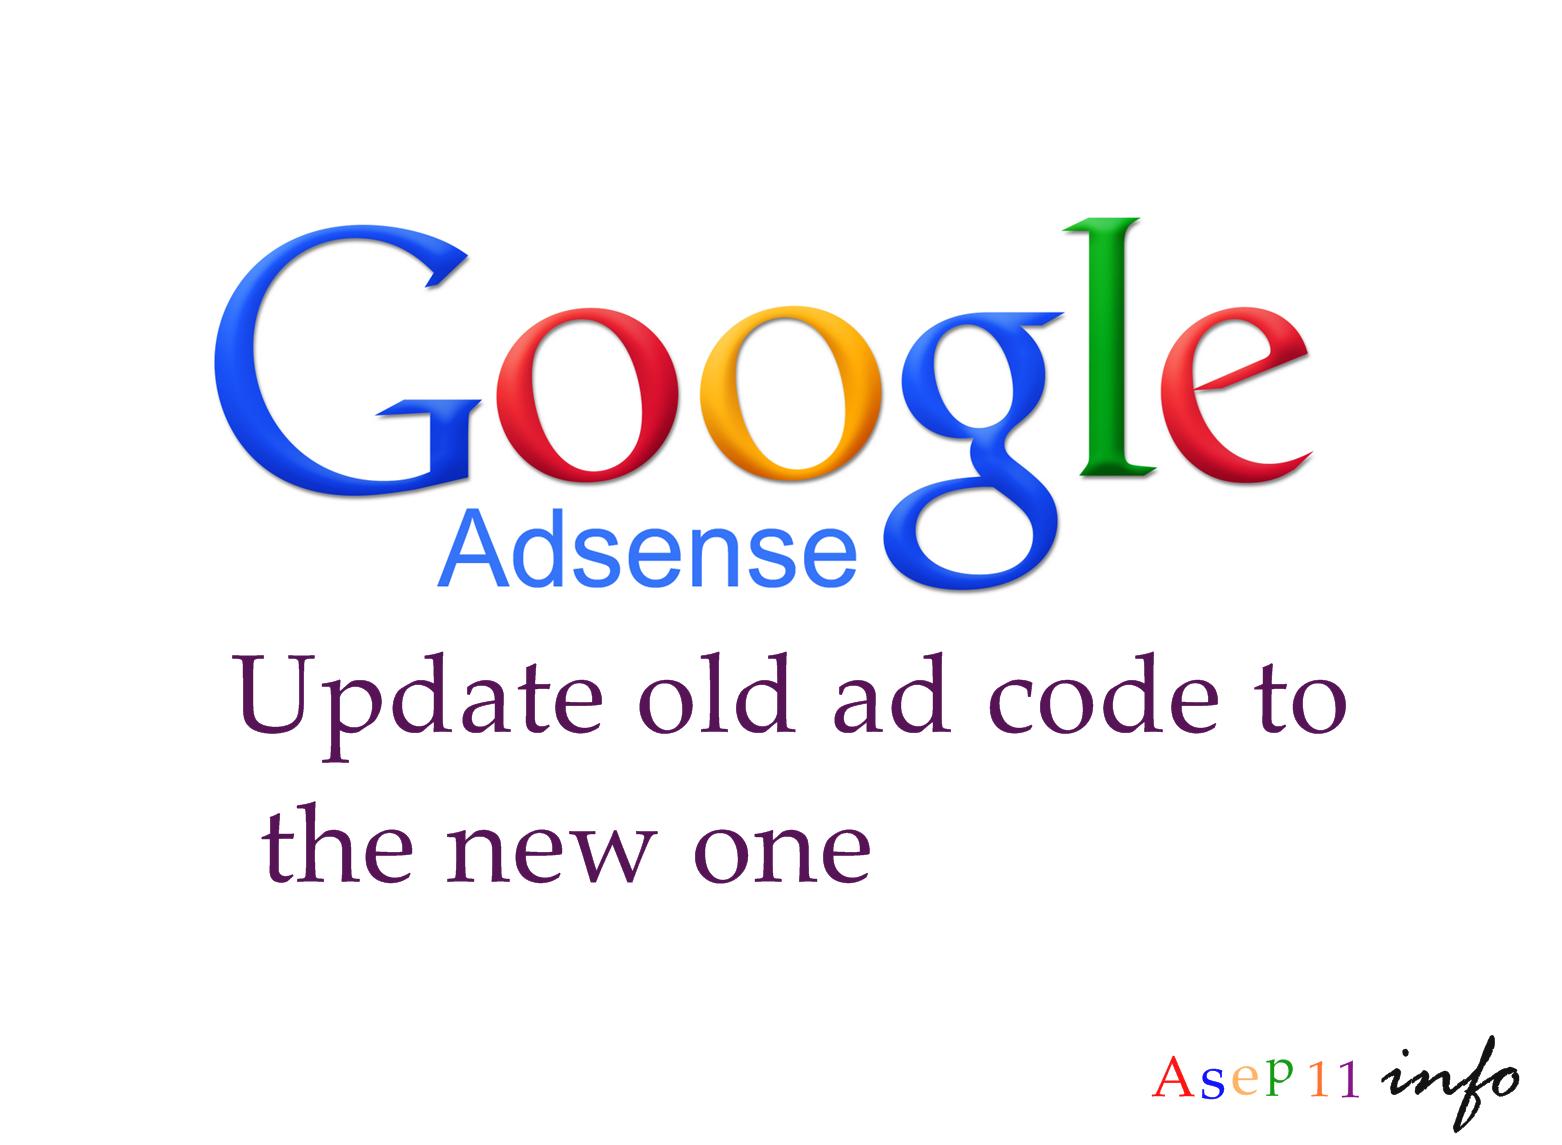 adsense asep11.info